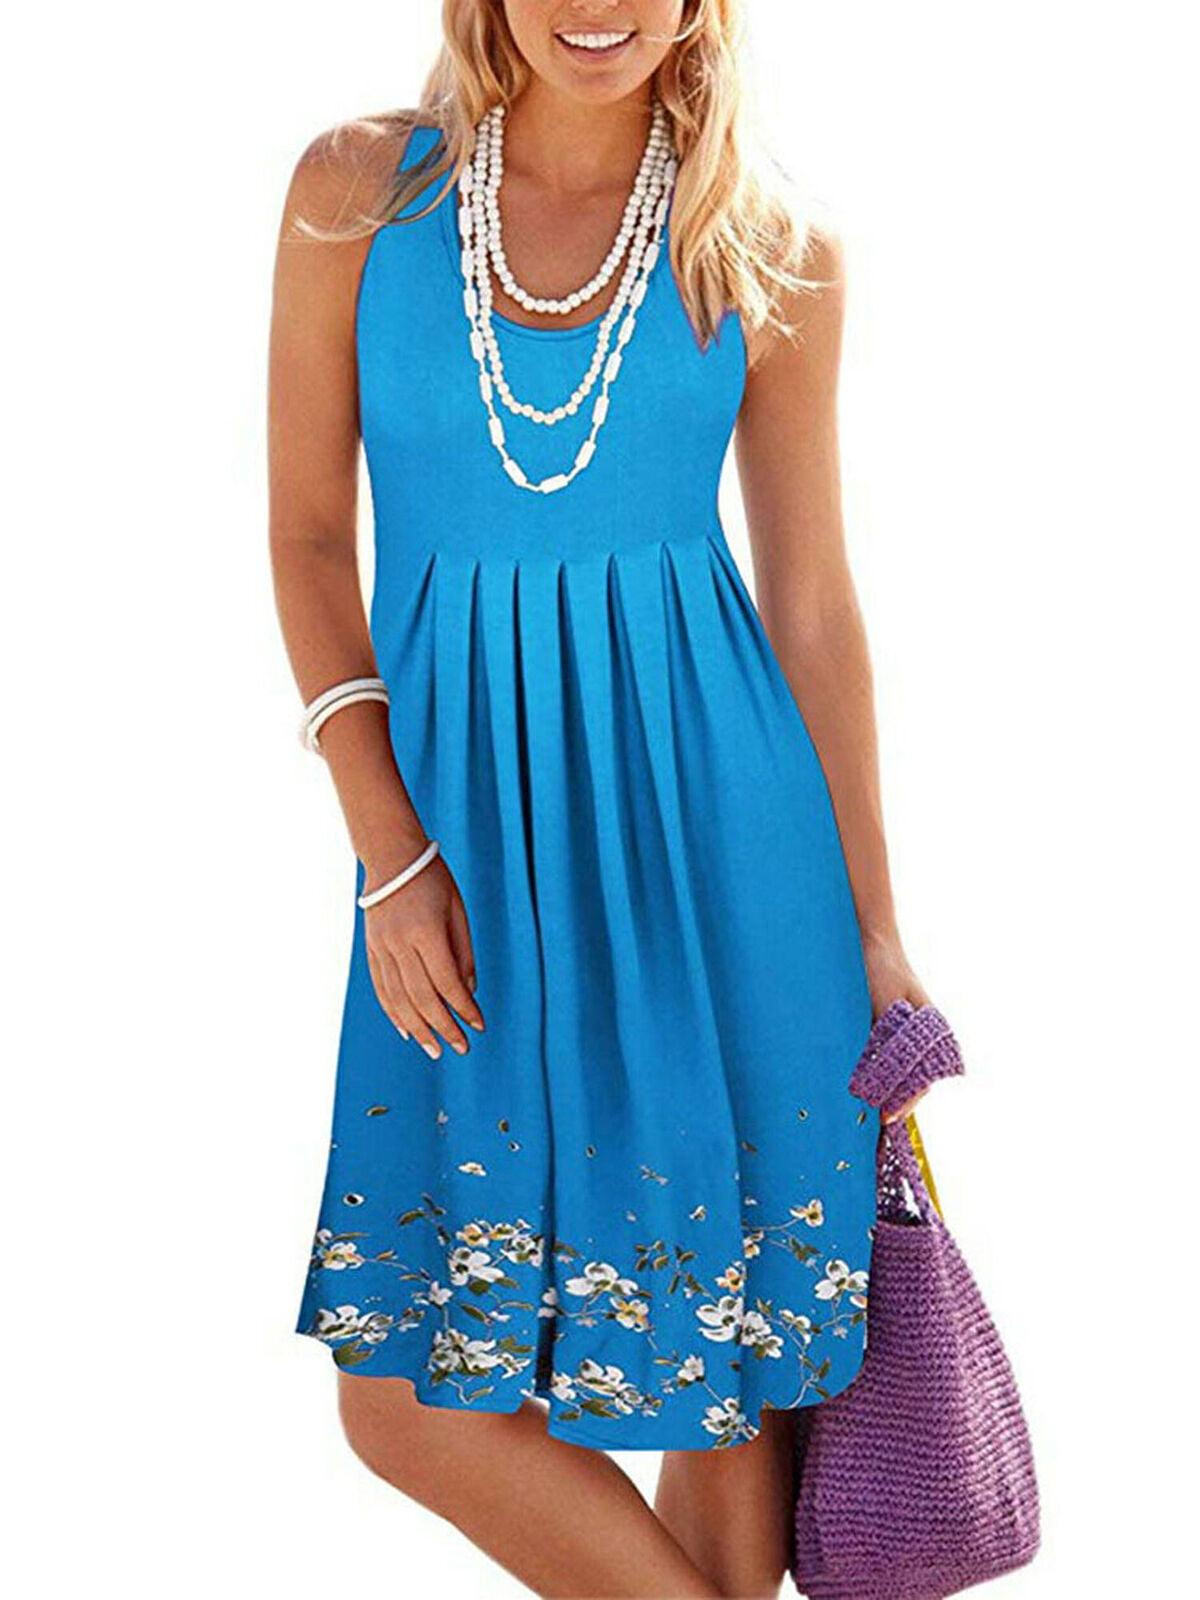 Pleated Sundress Boho Strap Women/'s Beach Dress Summer Party Evening Cocktail